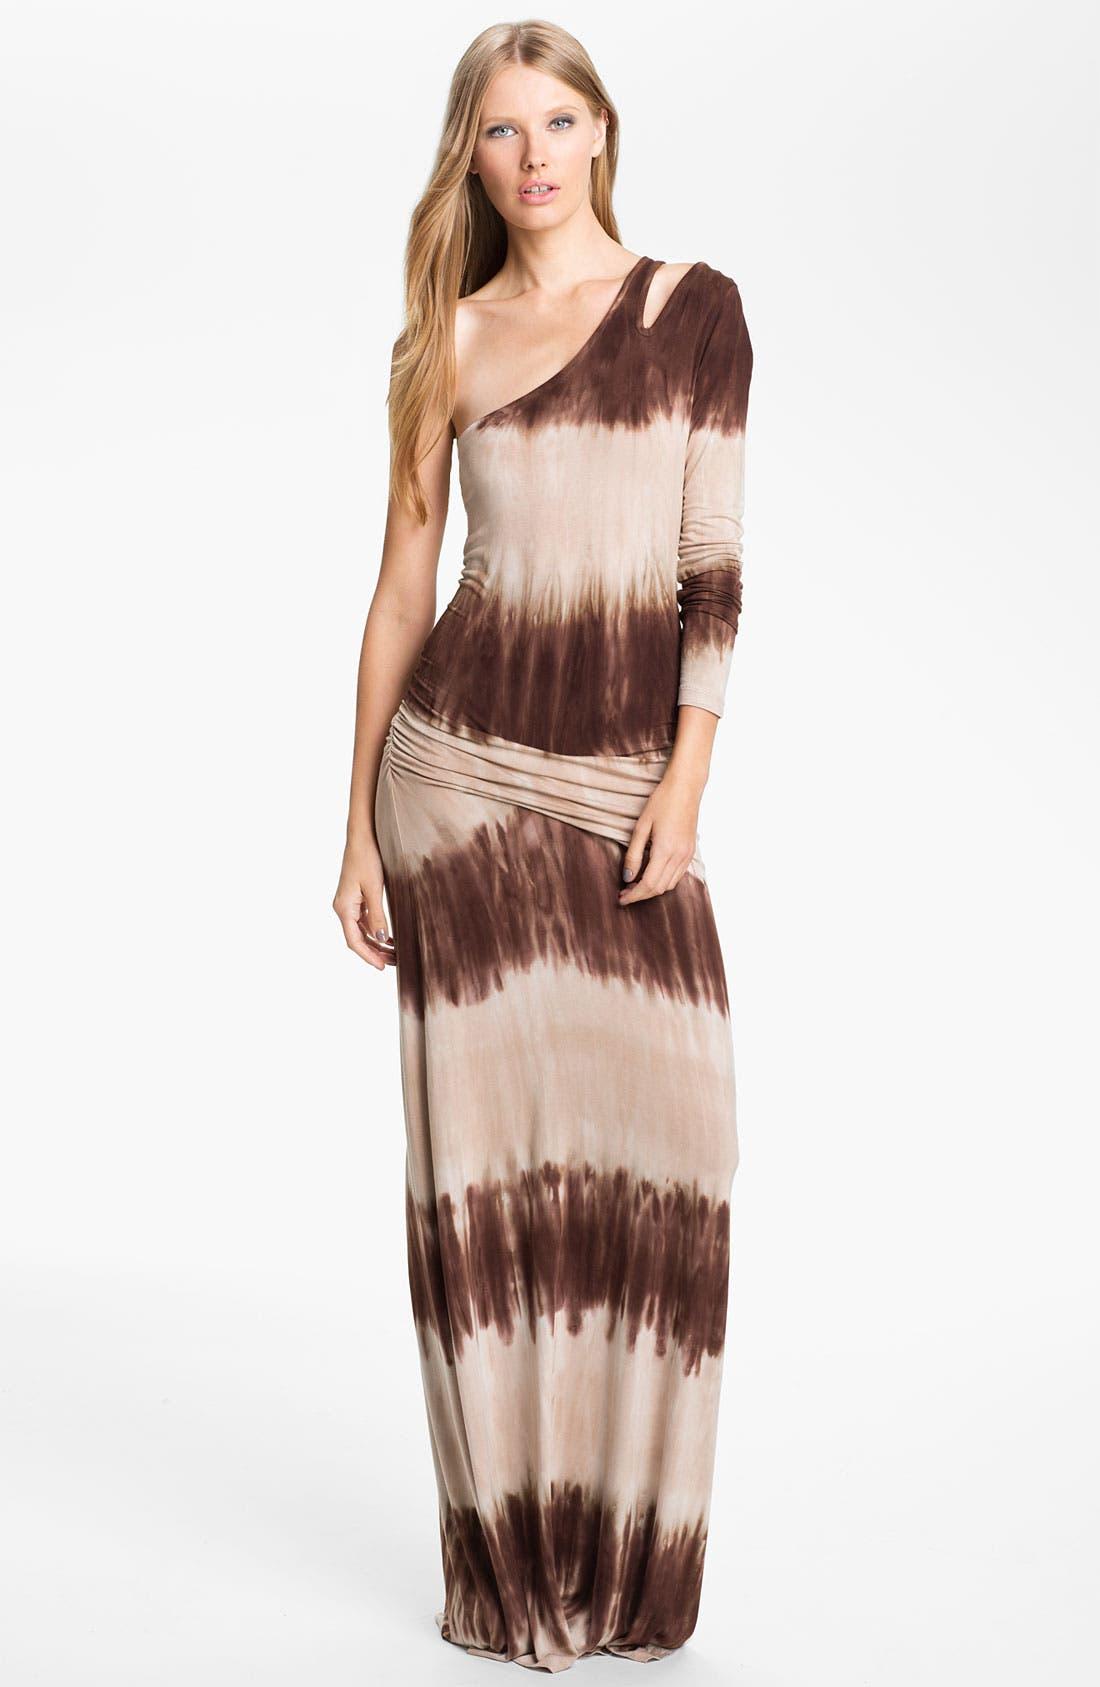 Main Image - Young, Fabulous & Broke 'Vinny' One Shoulder Maxi Dress